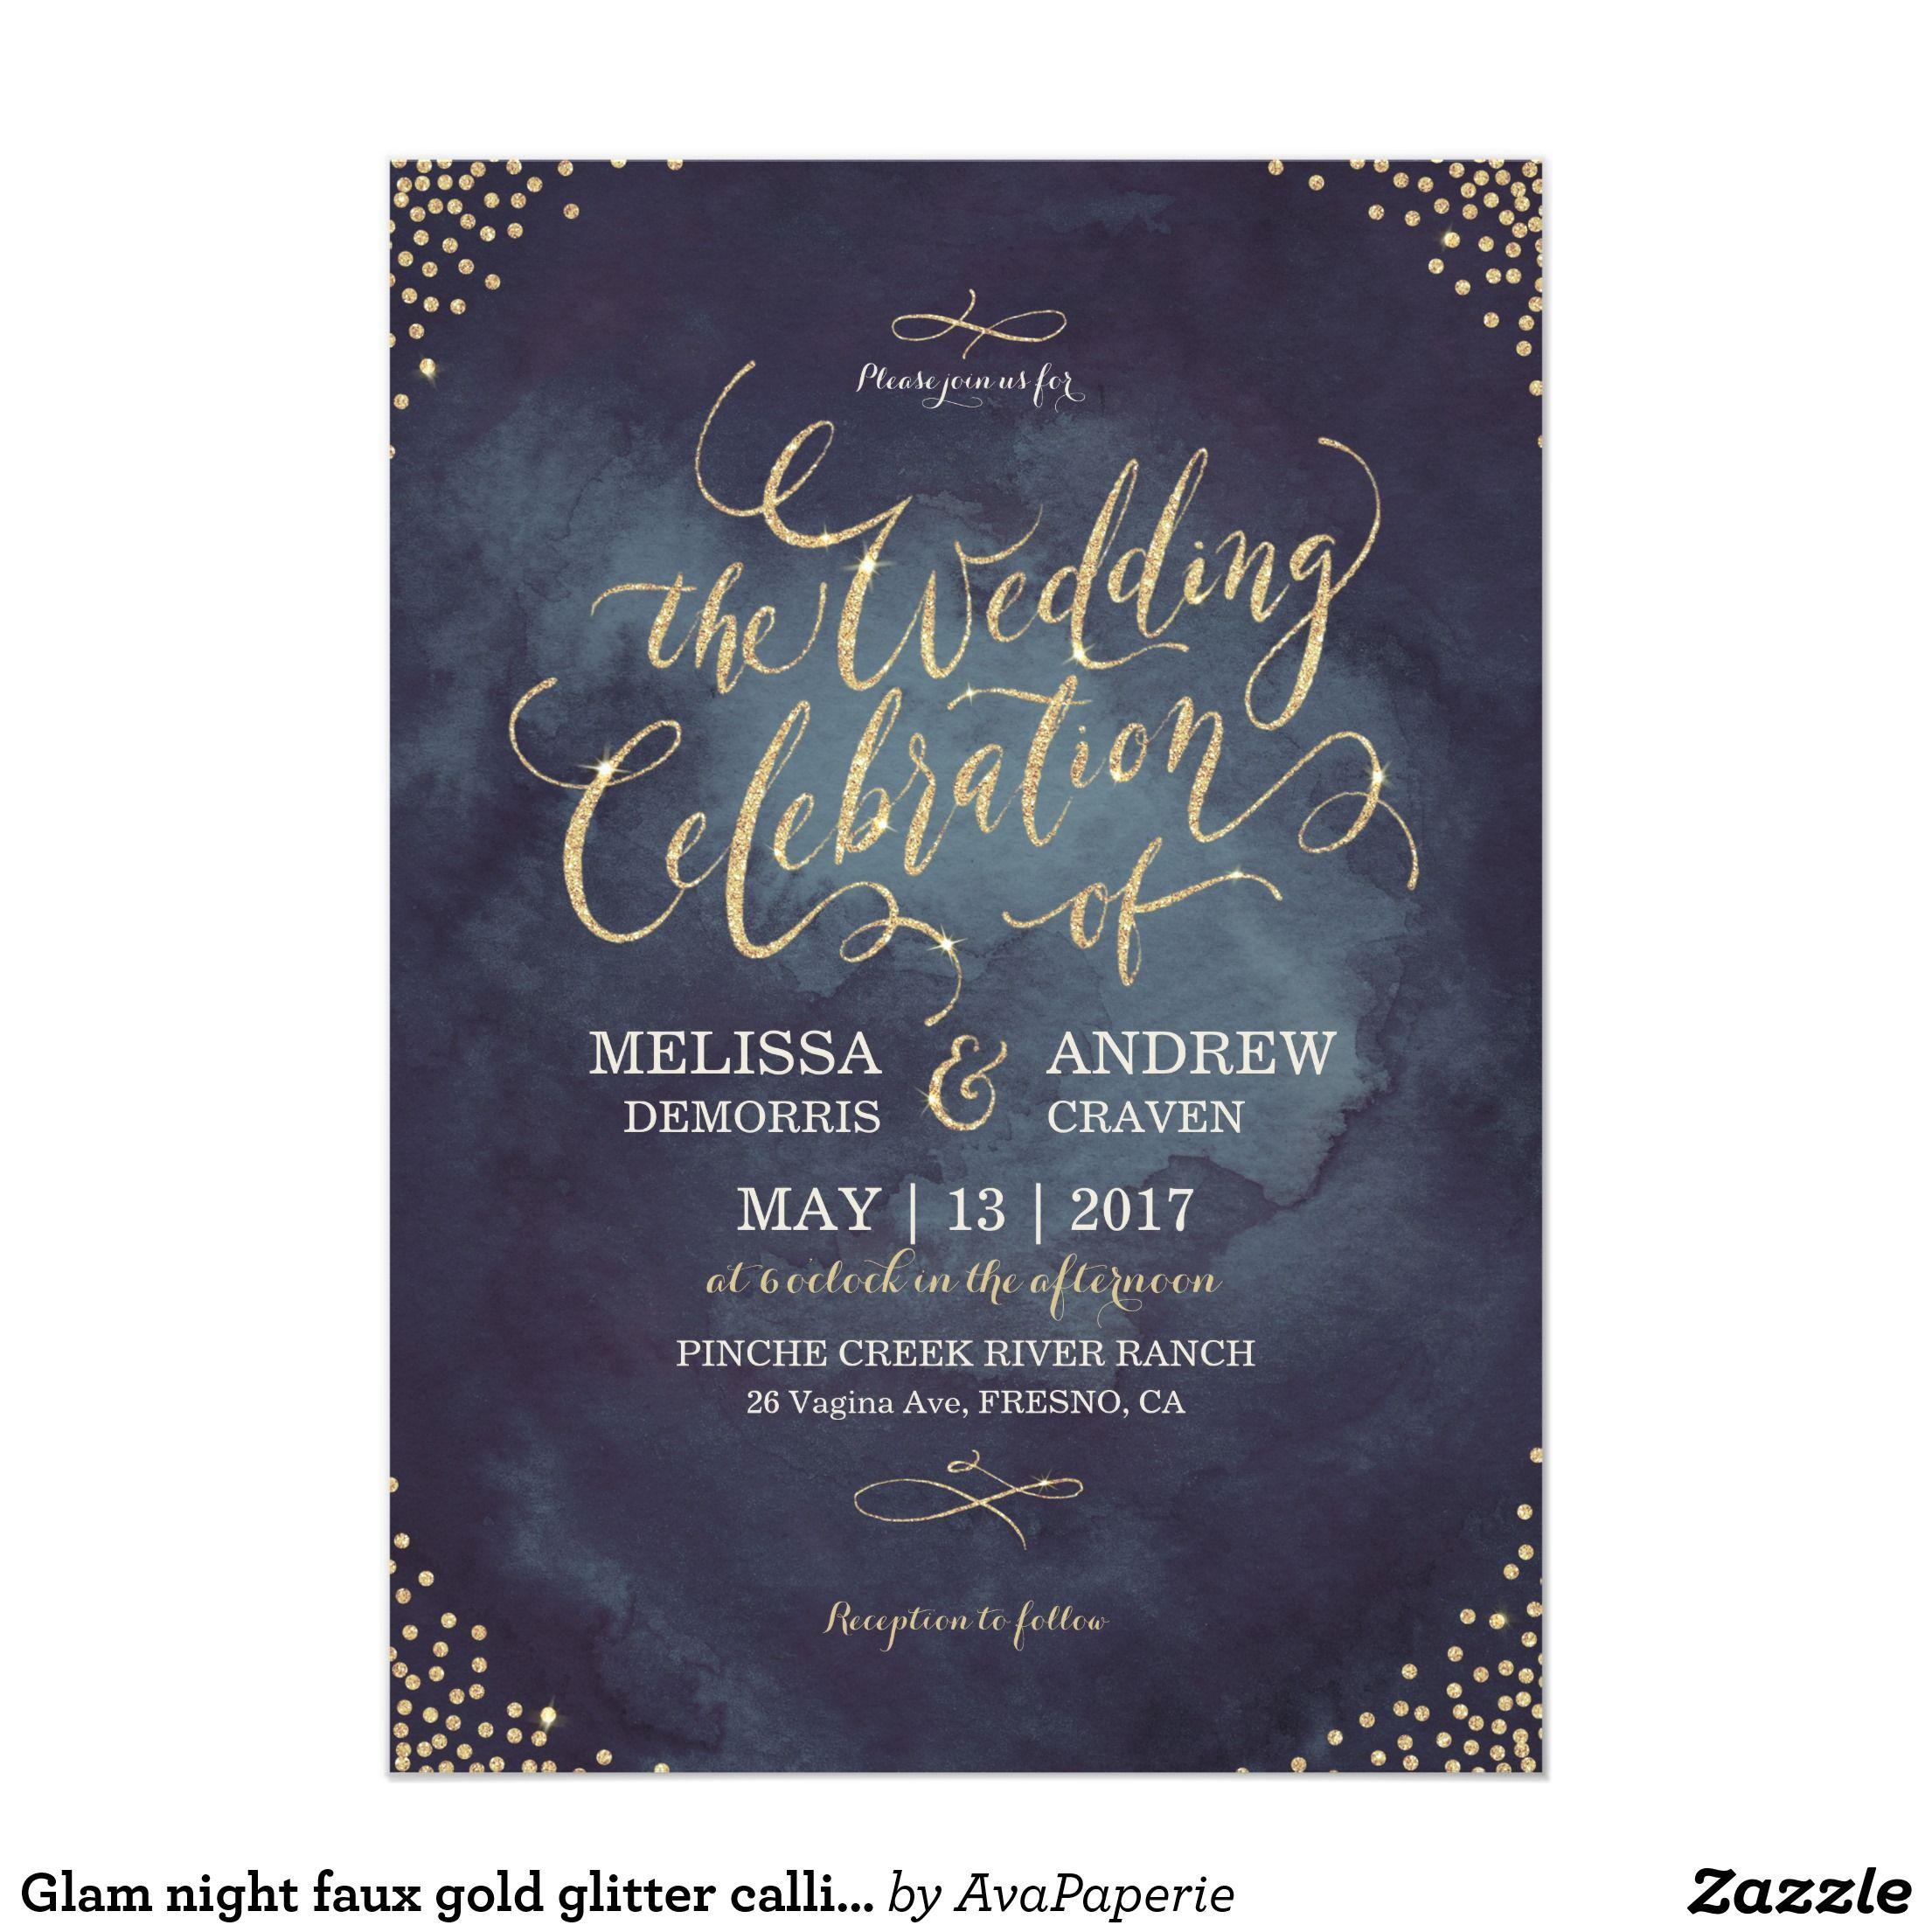 Glam night faux gold glitter calligraphy wedding card   結婚式(招待 ...